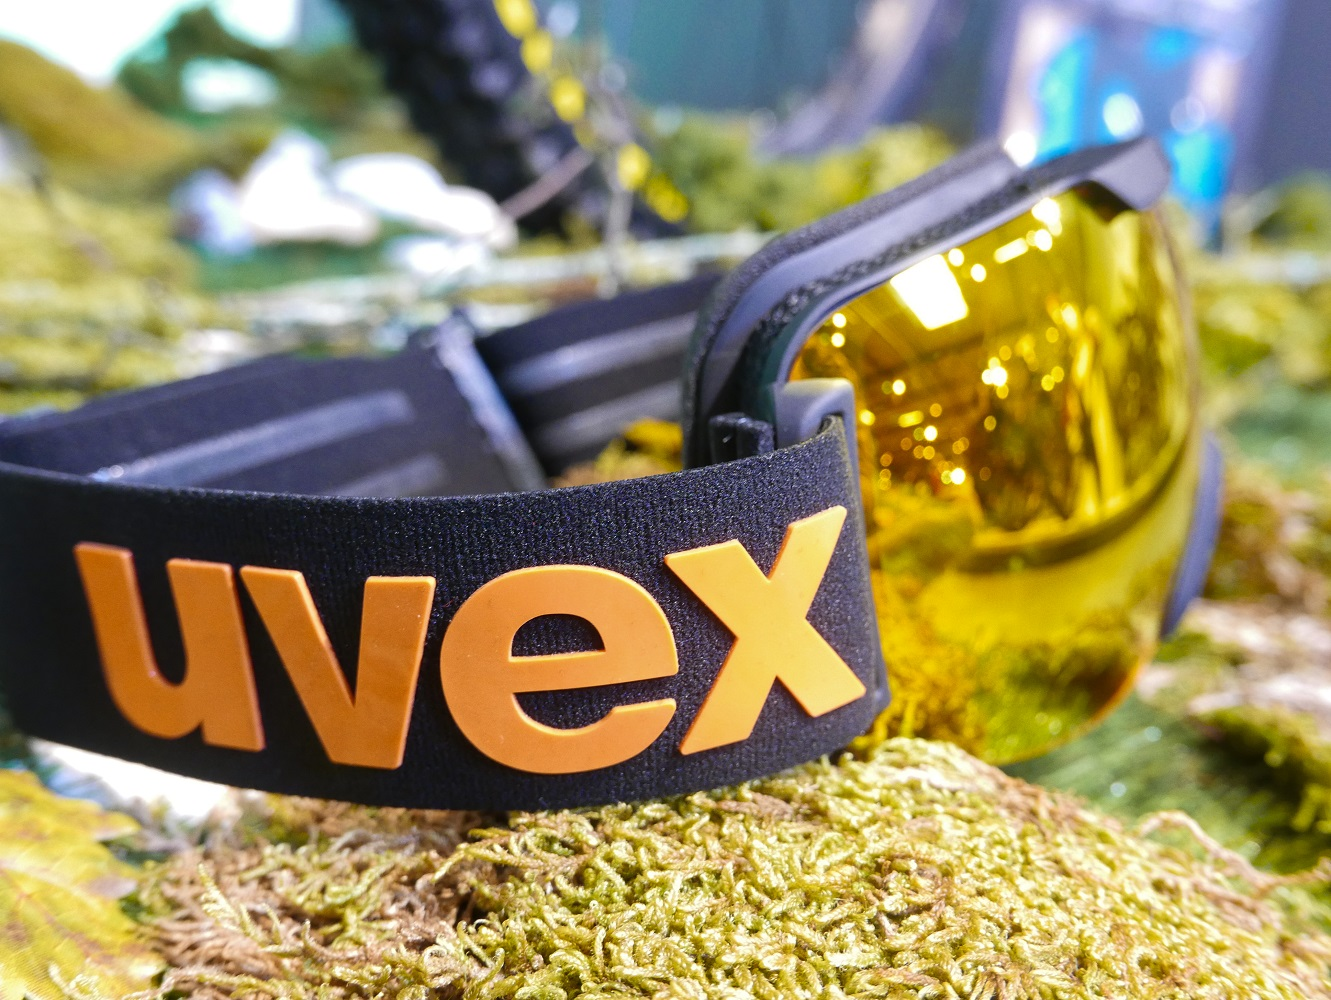 Uvex Downhill 2000 CV Ansicht